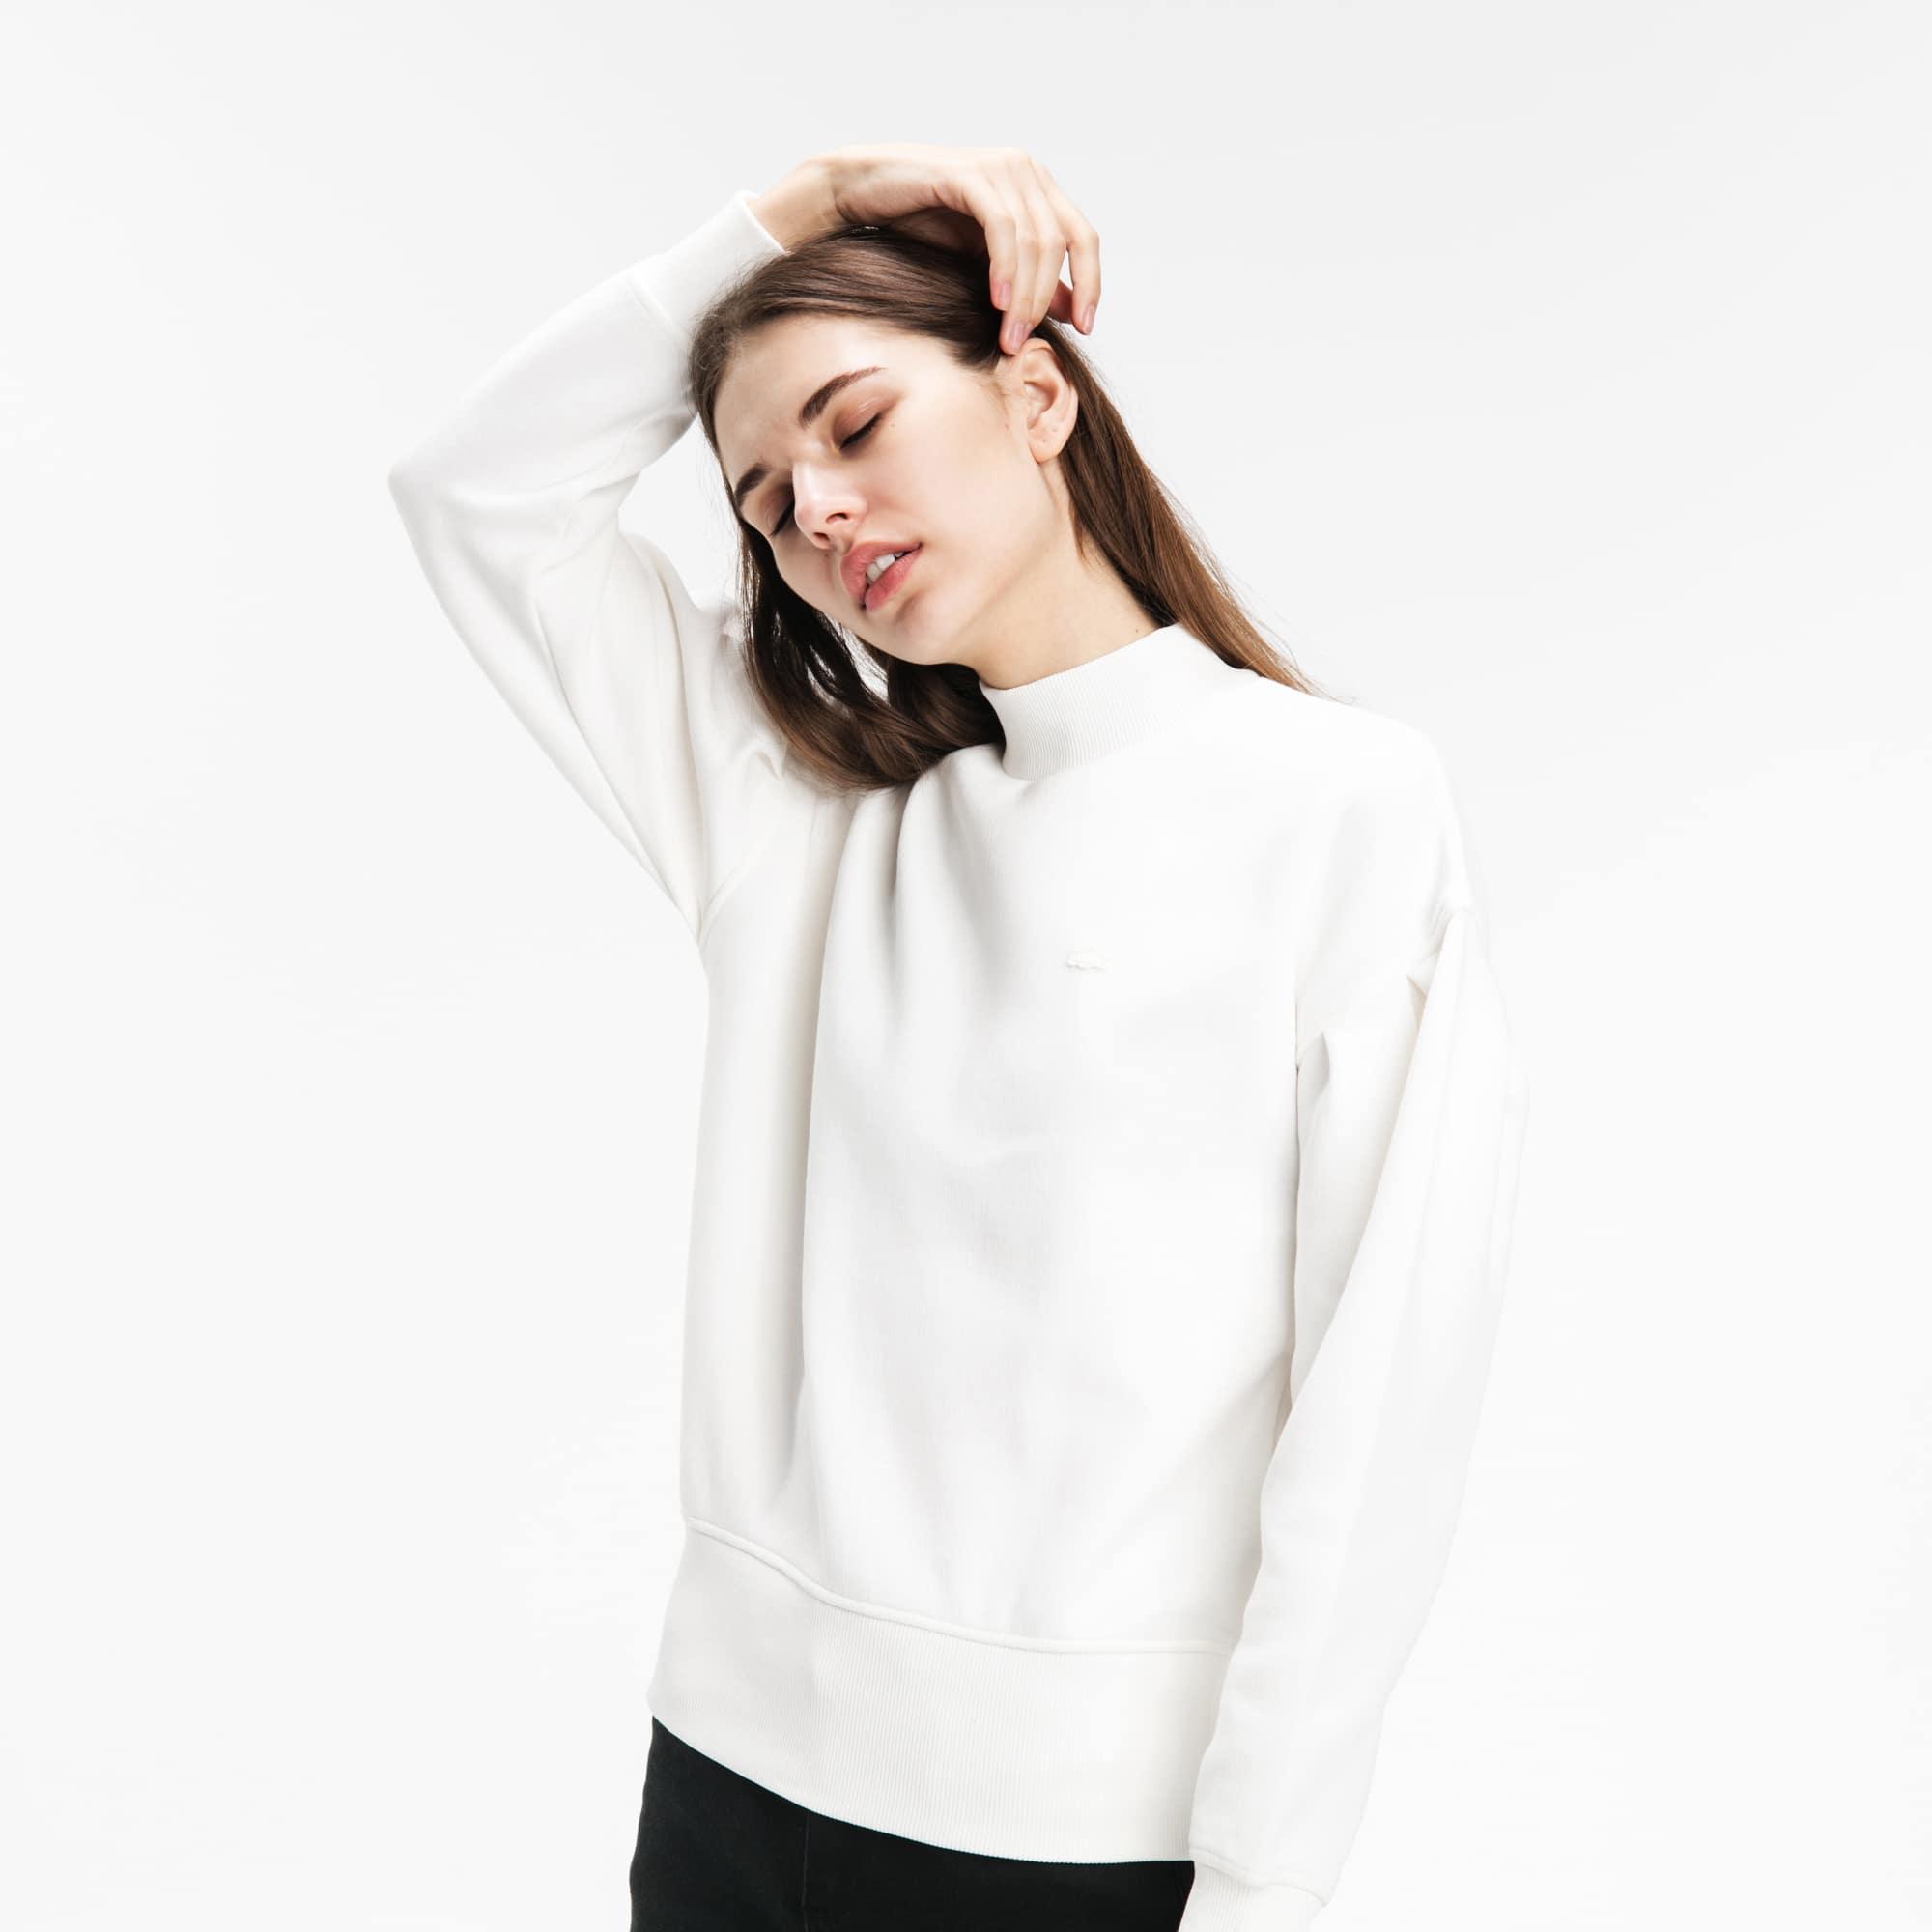 Lacoste LIVE女士泡泡袖套头羊毛运动衫